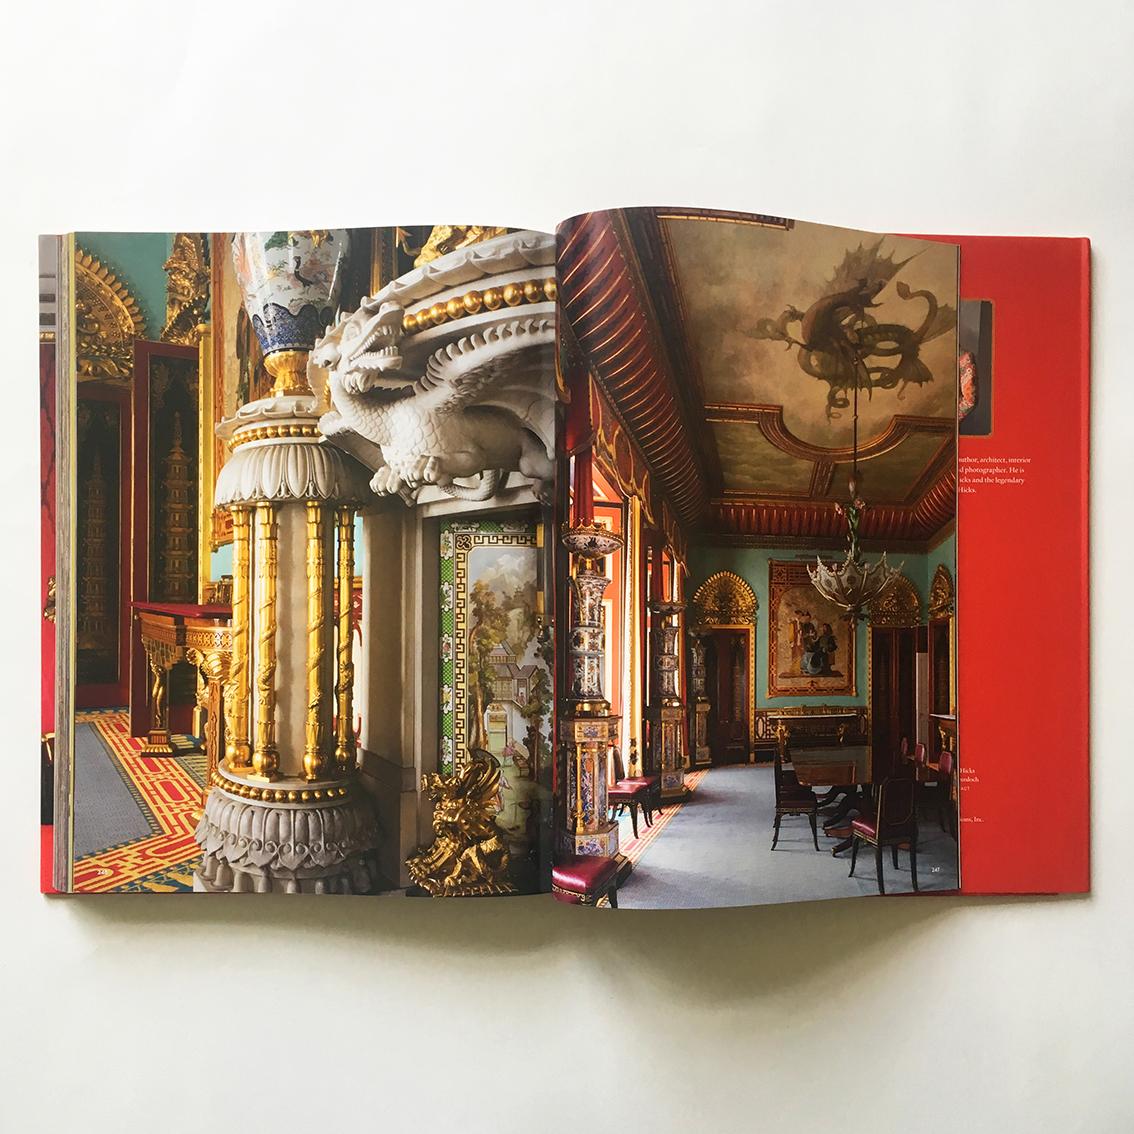 Buckingham_Palace_Ashley_Hicks_3.jpg